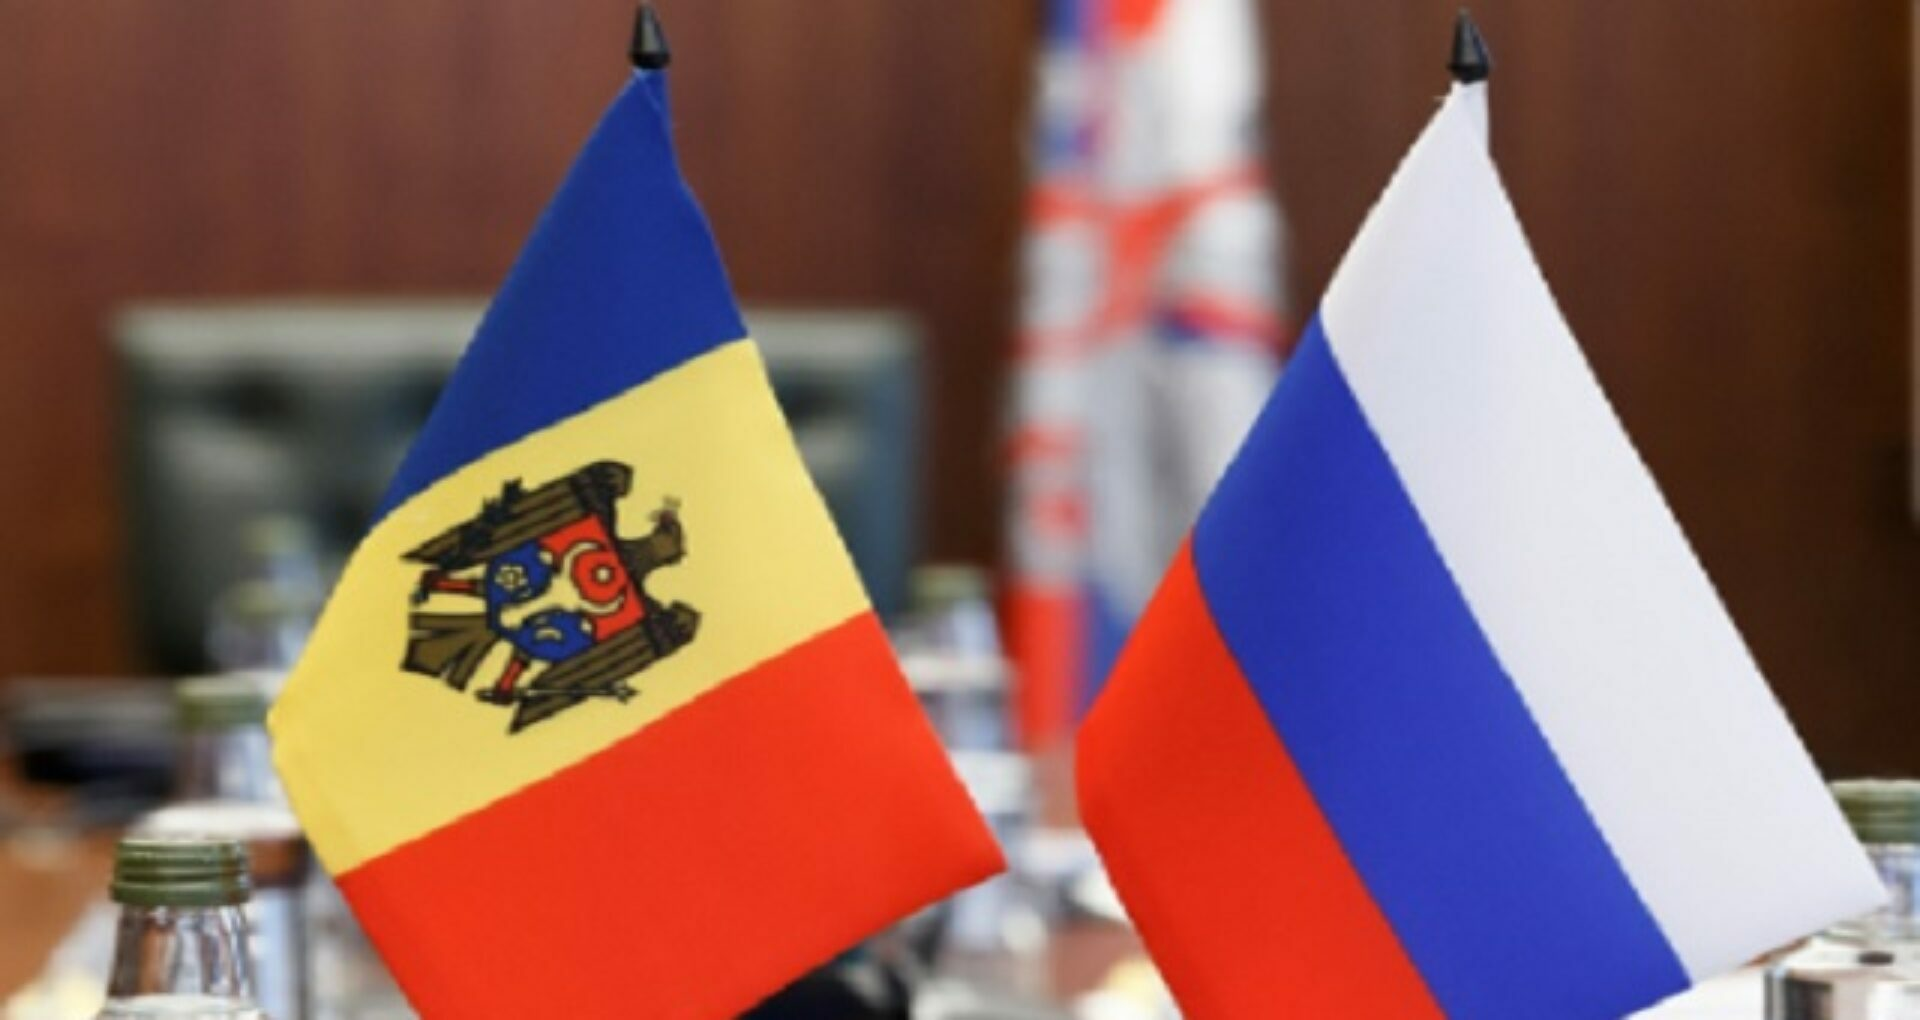 Russia Accuses Moldova of Undermining Peacekeeping Operation in the Breakaway Transnistrian Region